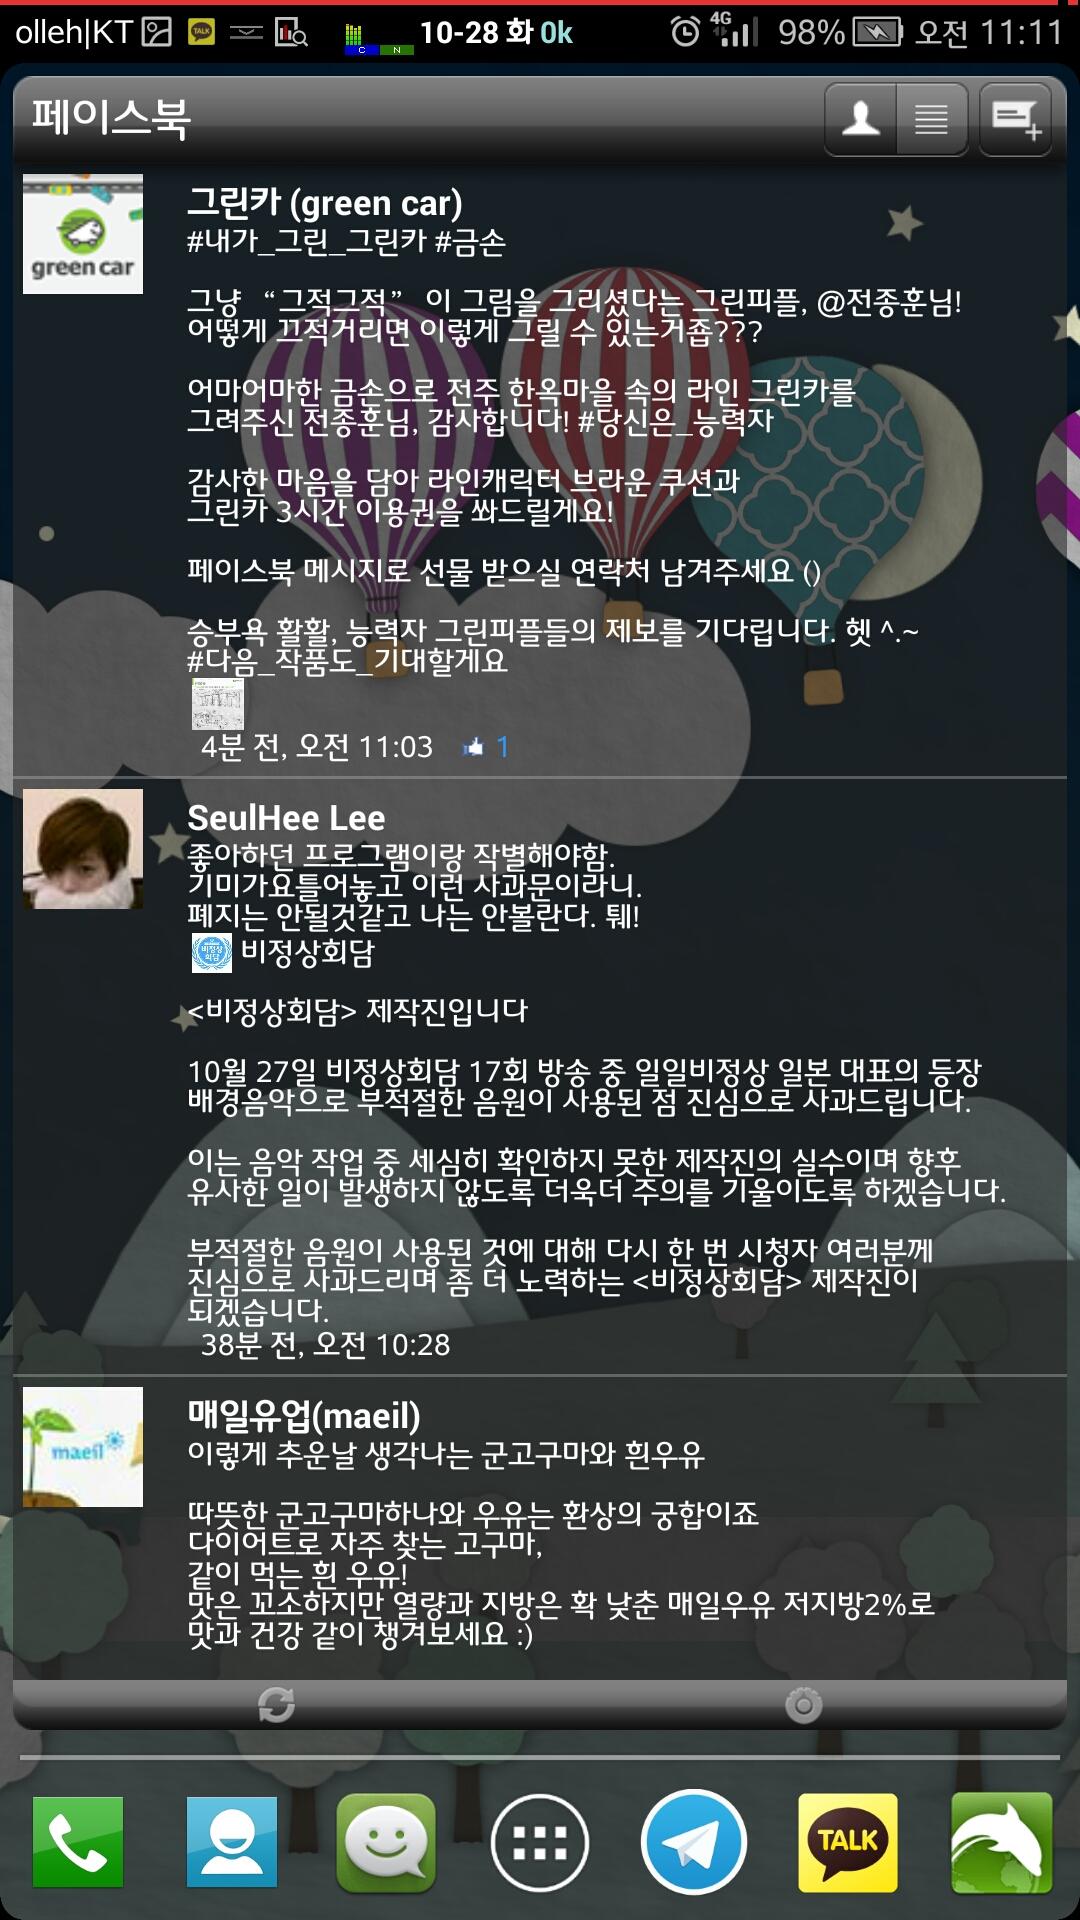 Screenshot_2014-10-28-11-11-52.jpeg